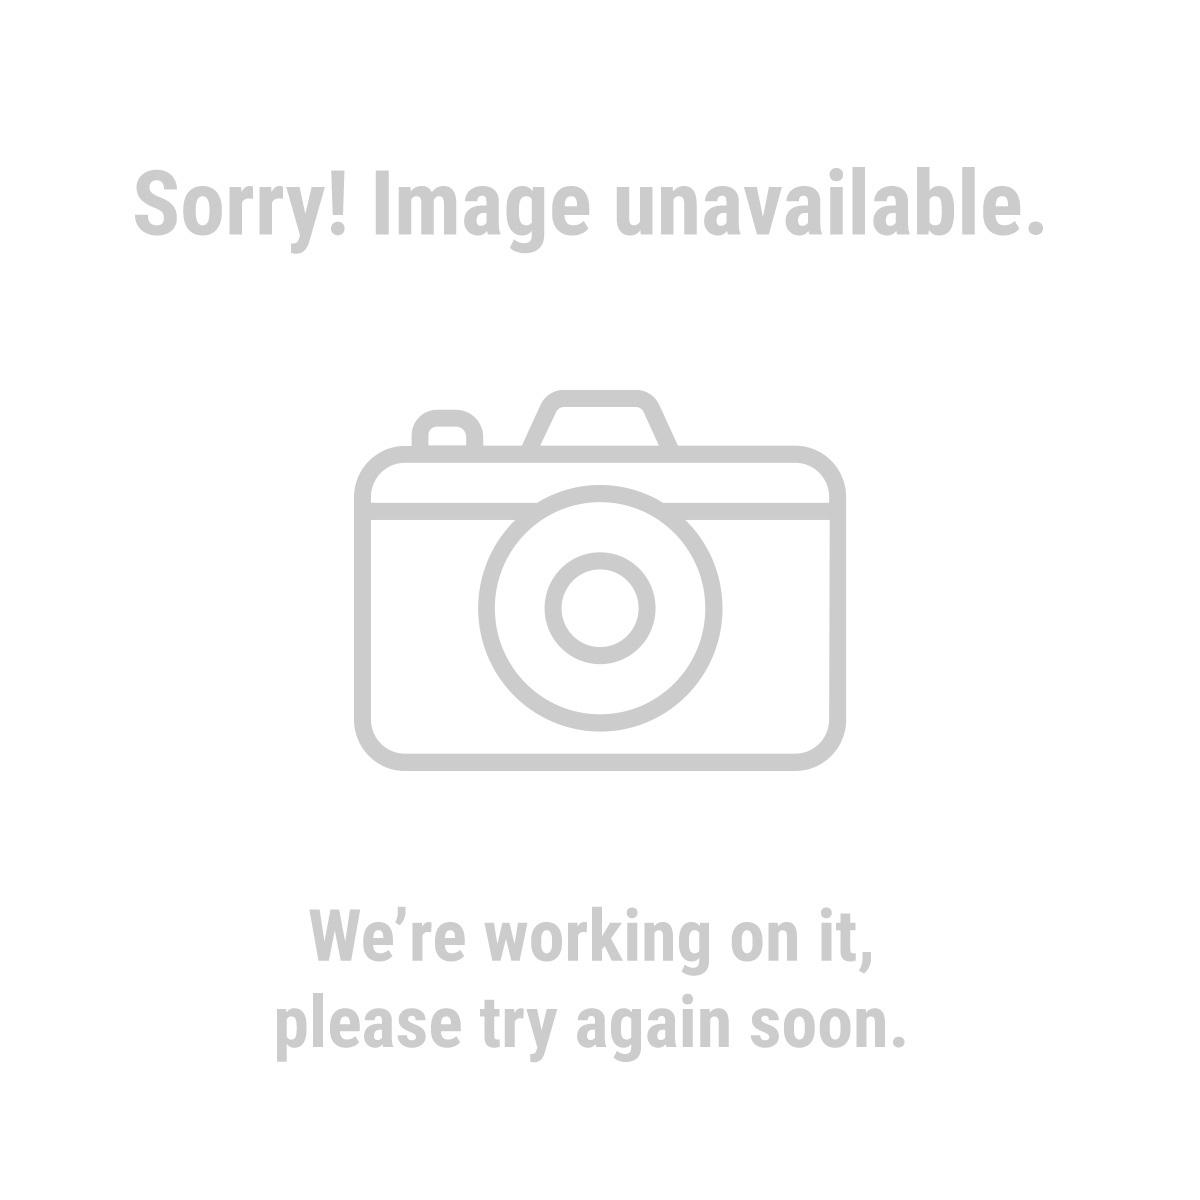 Haul-Master® 60732 1/2 Ton Capacity Pickup Truck Crane